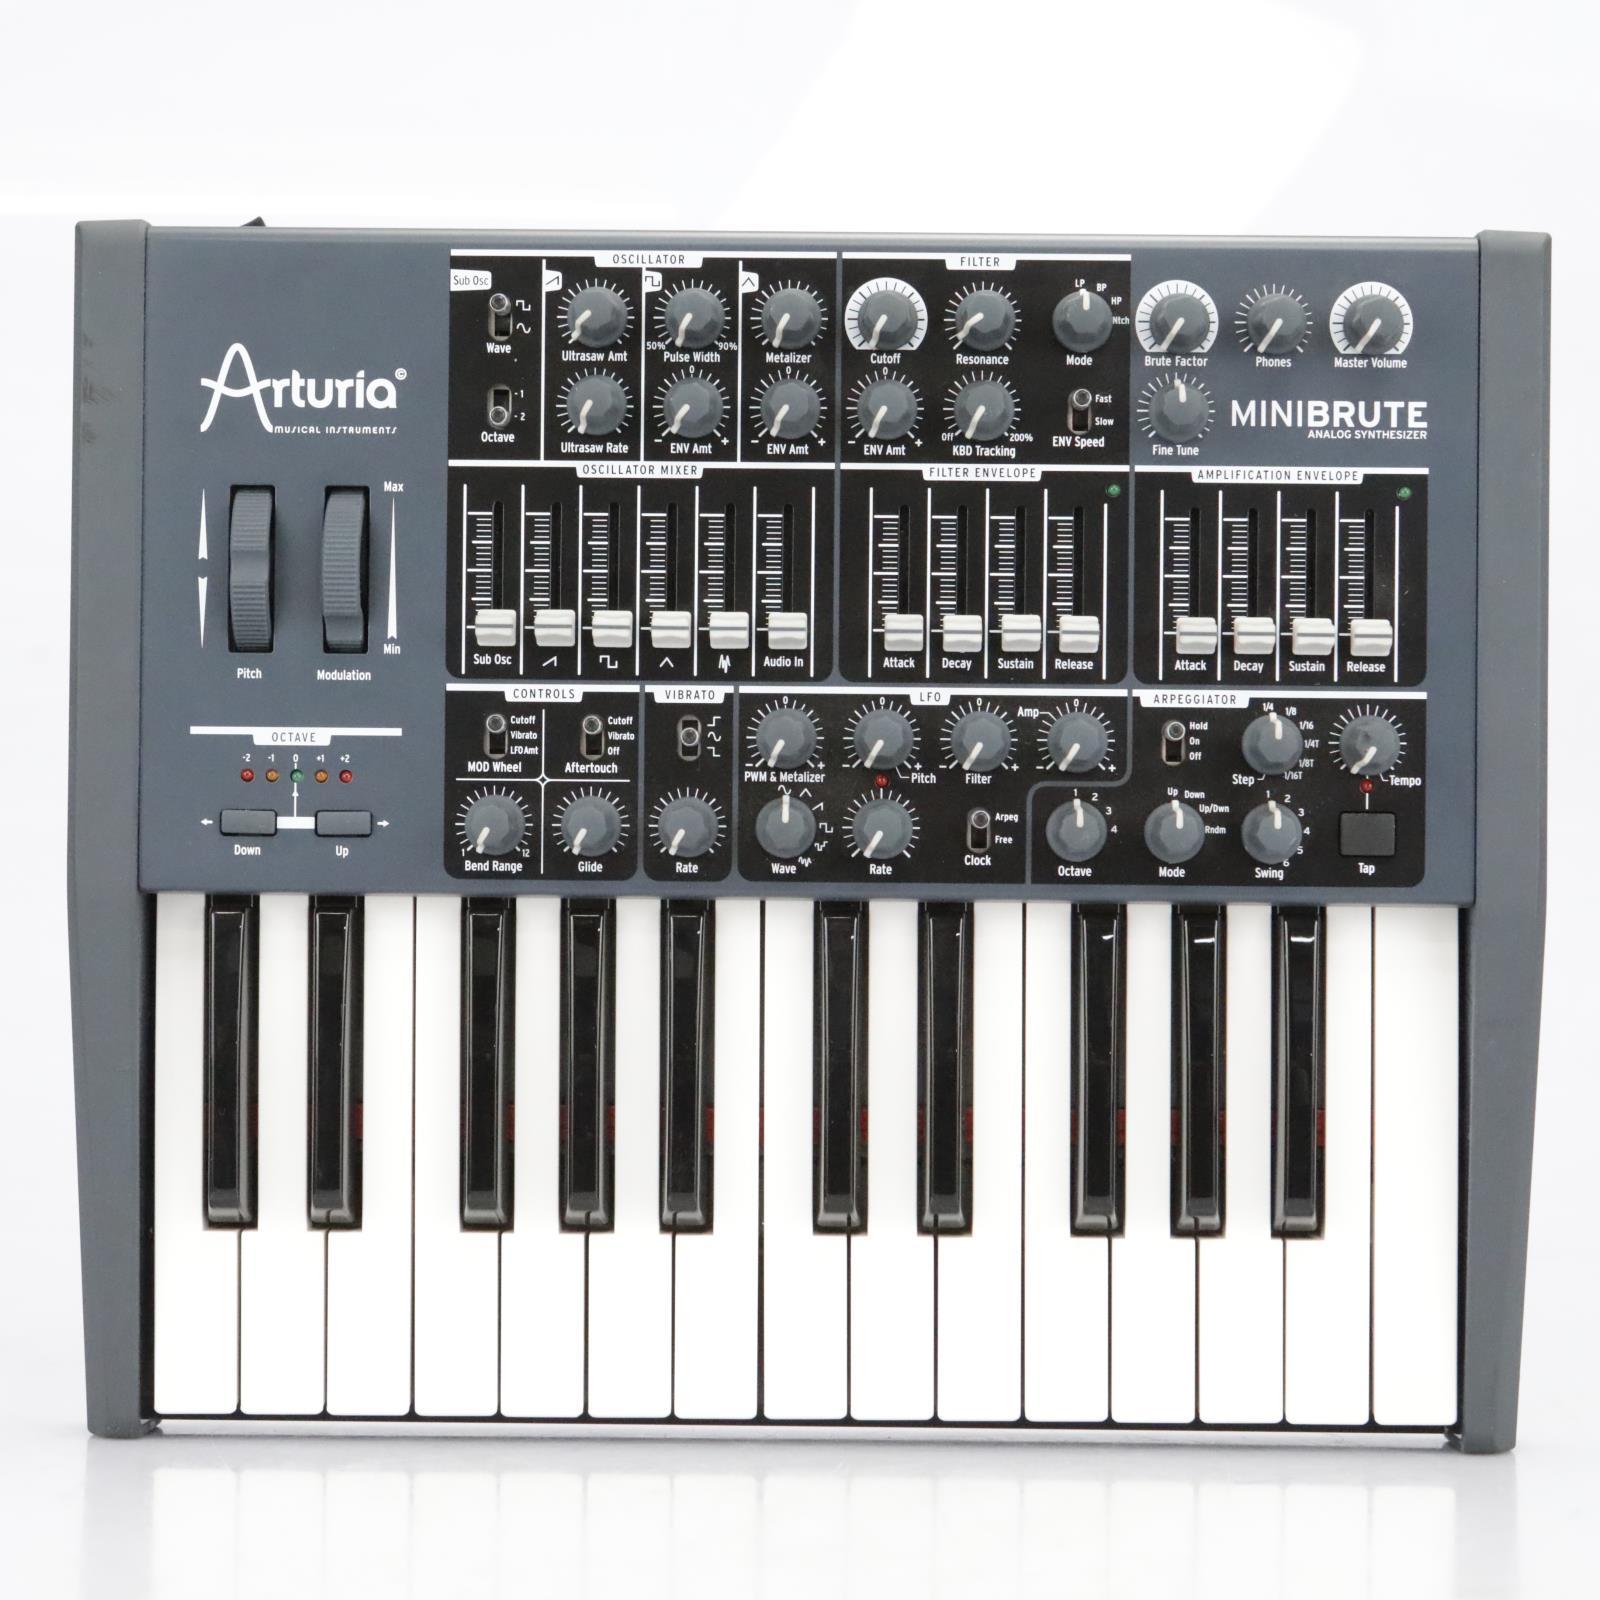 Arturia Minibrute Analog Synthesizer Keyboard #40901